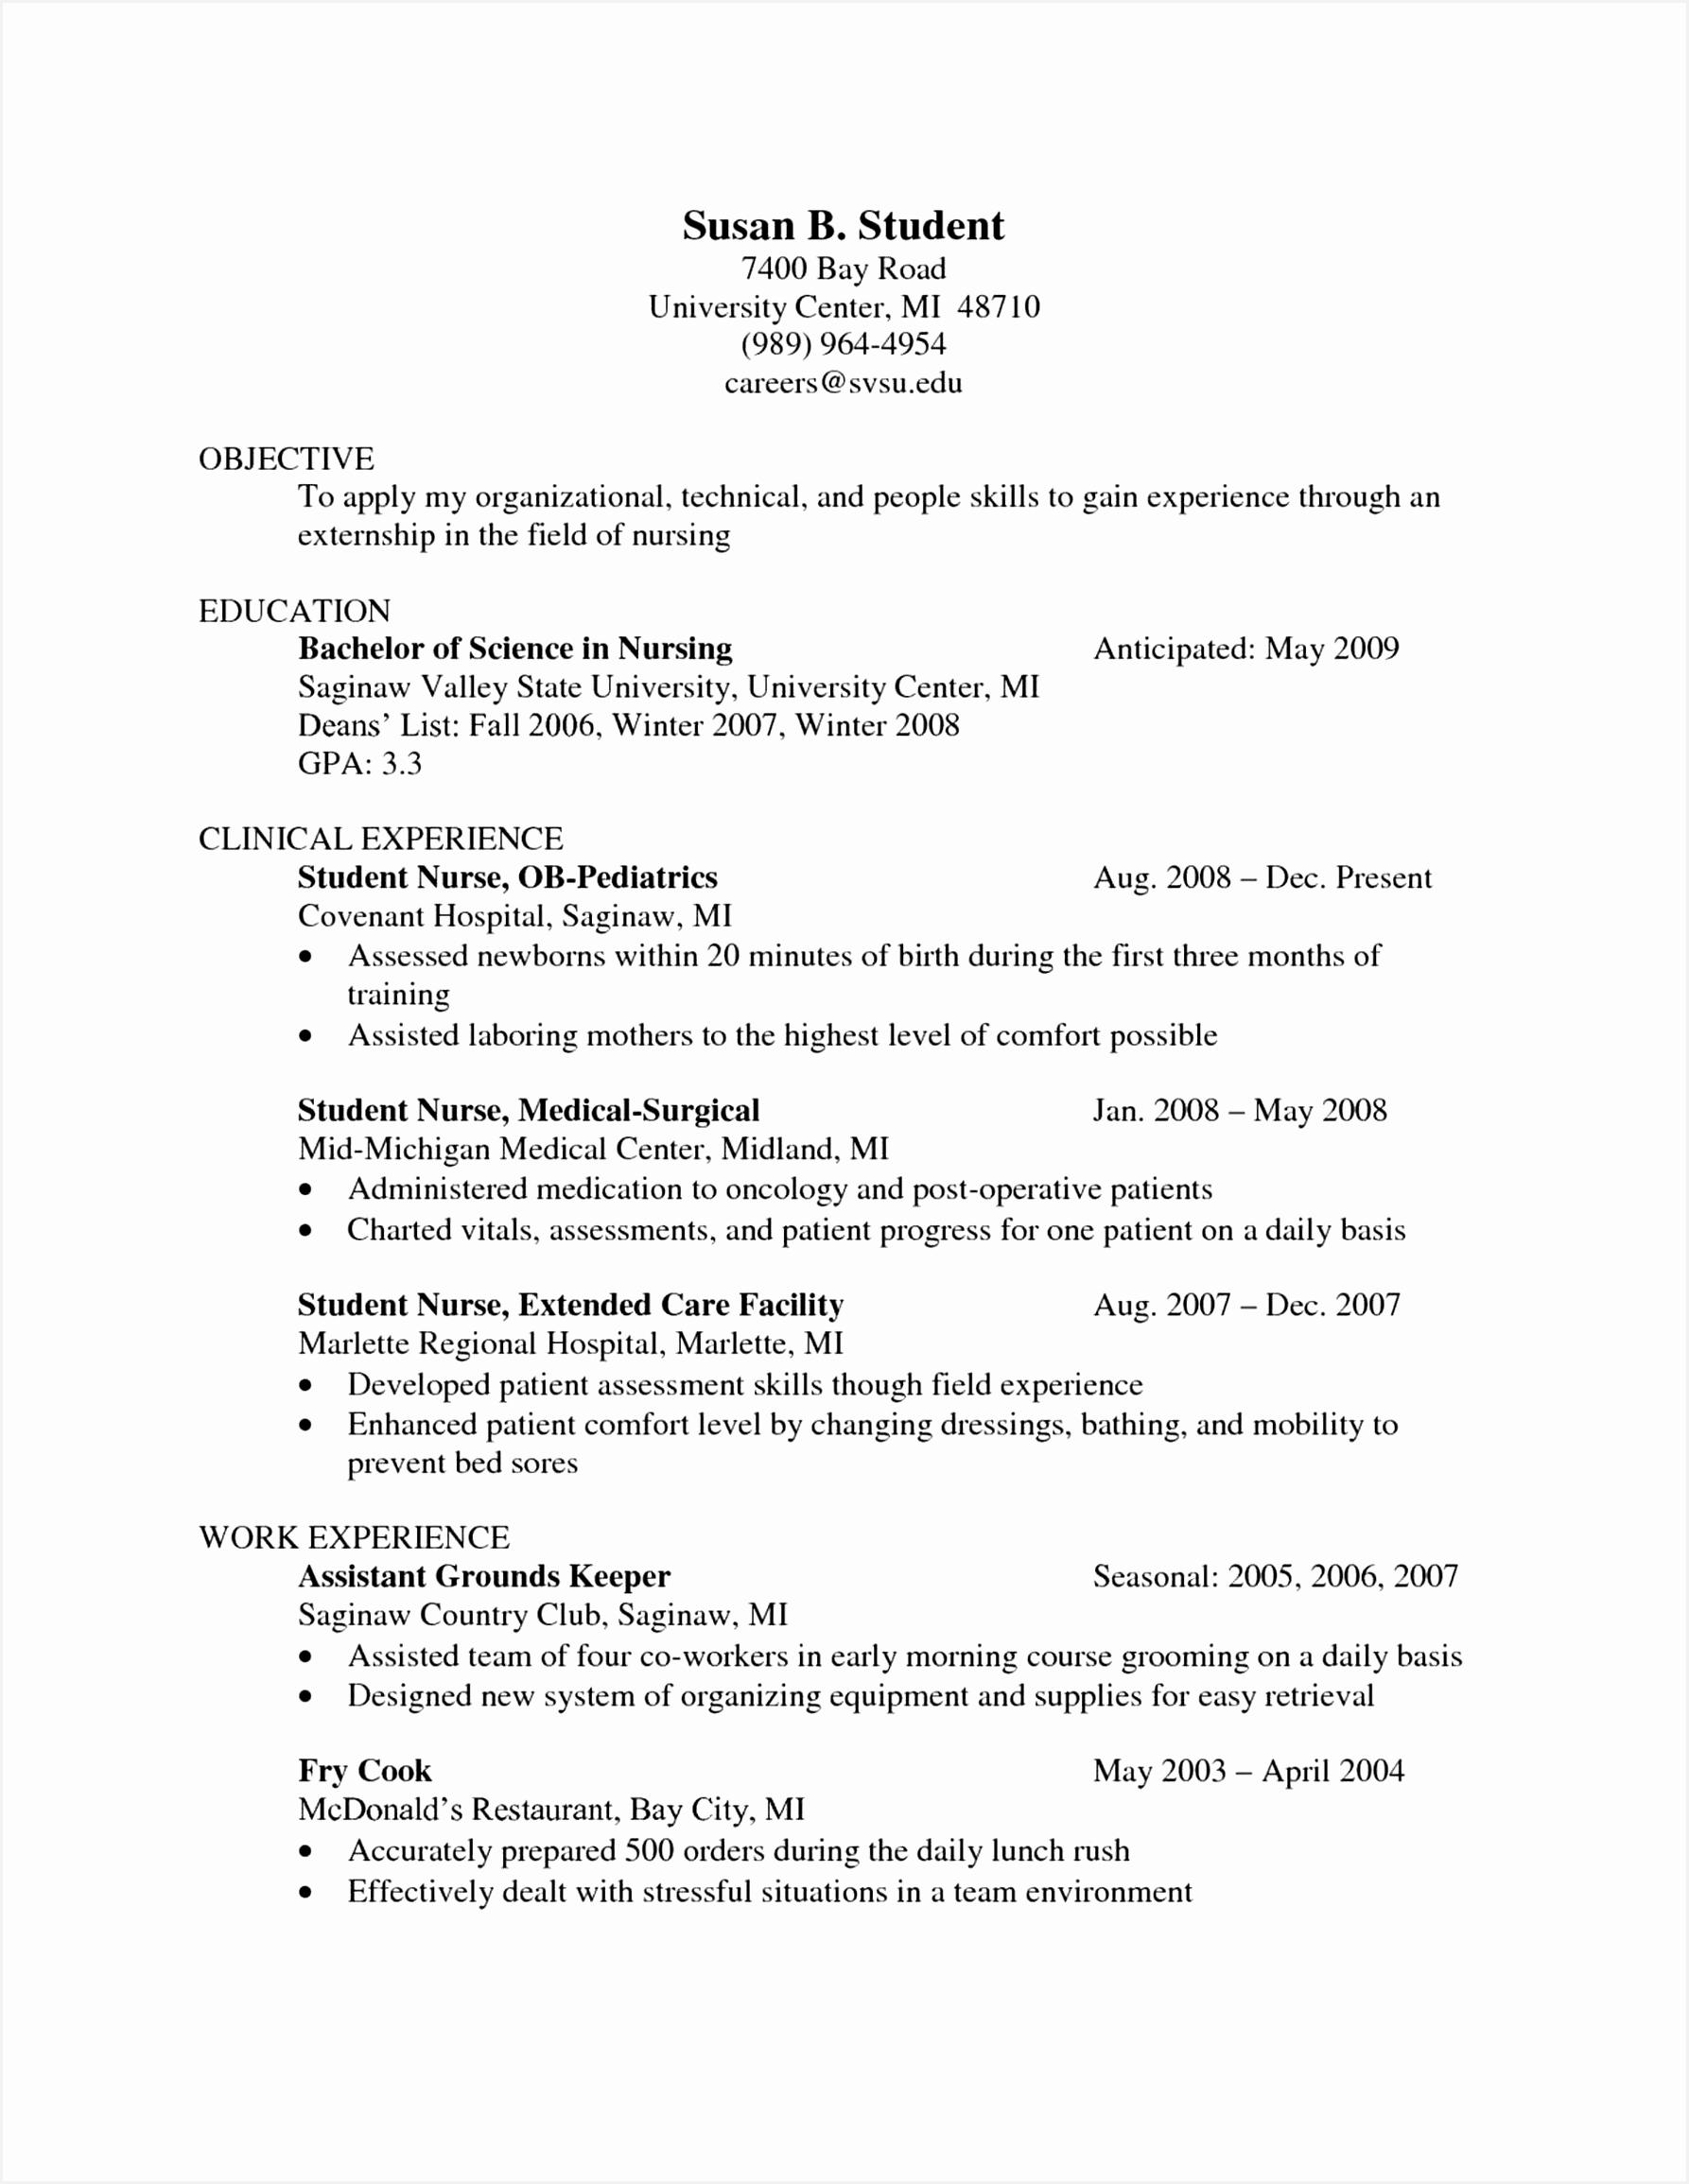 Resume Recent Graduate Yryqf New Graduate Nurse Resume Luxury Resume for Nurse Luxury New Nurse Of 9 Resume Recent Graduate